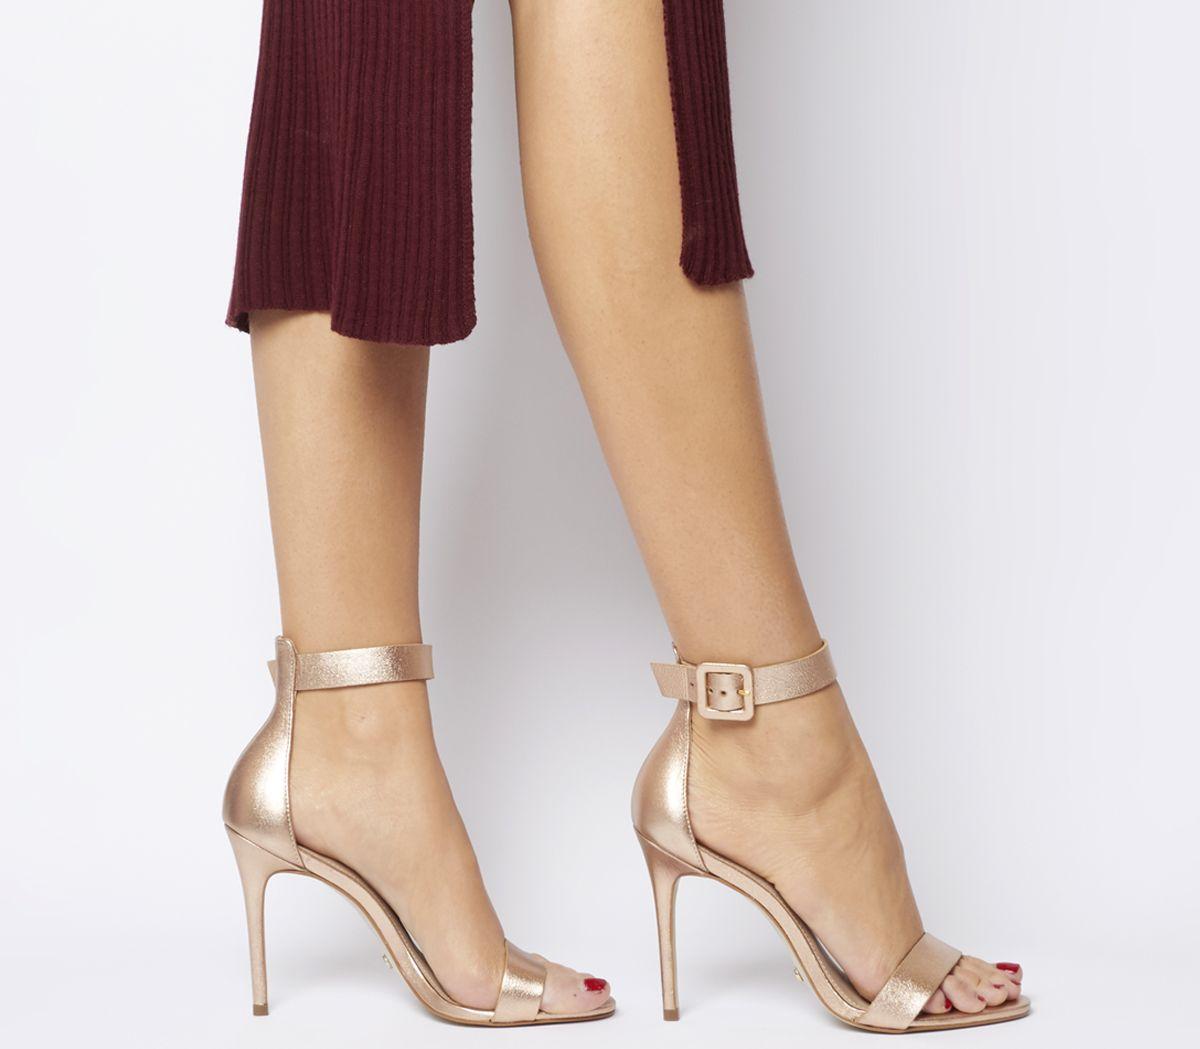 5026734392c Heart Two Part Sandal Heels